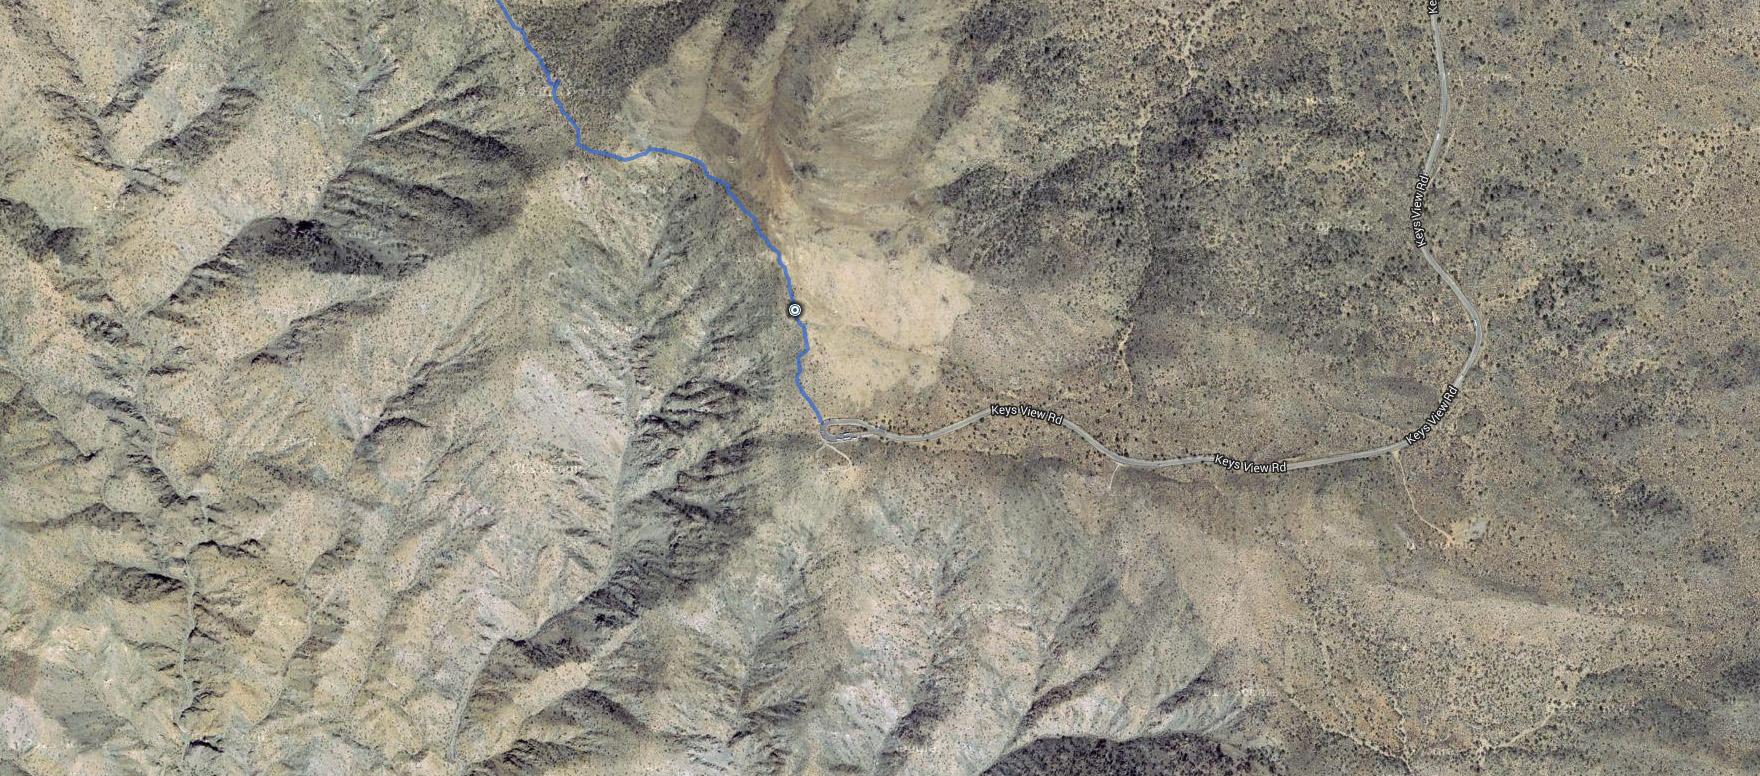 2014-03-29-MountInspirationGPS